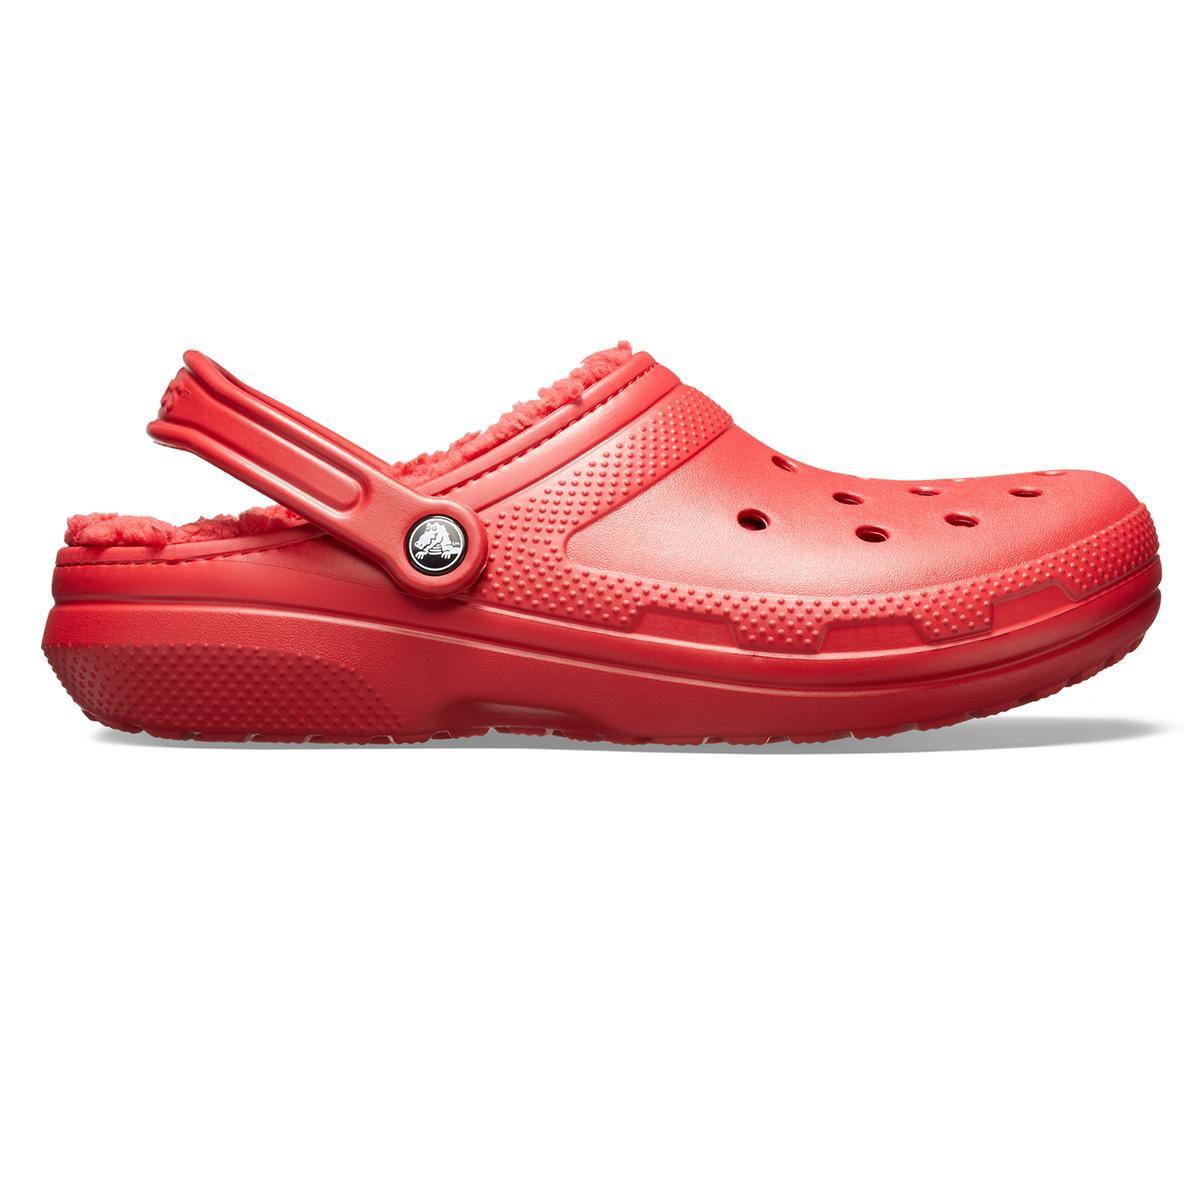 Classic Lined Clog - Kırmızı Biber/Kırmızı Biber